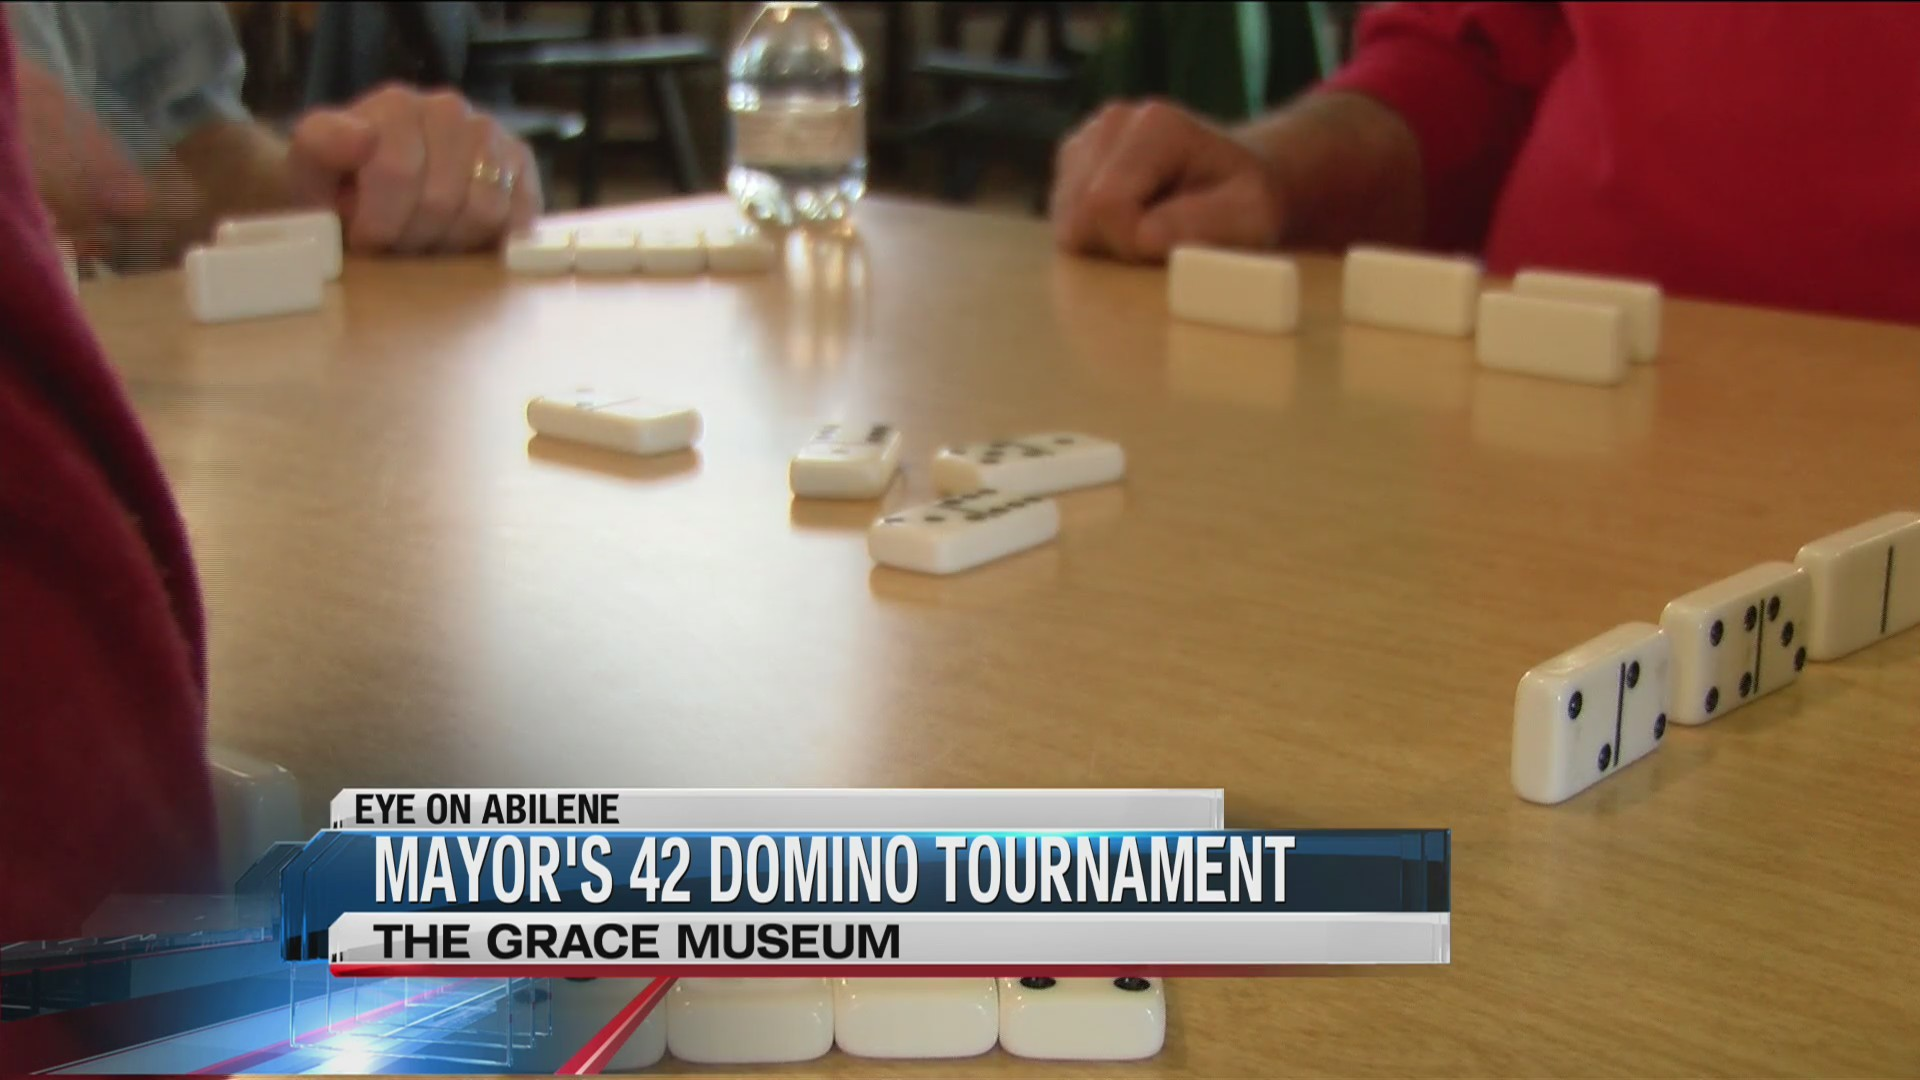 Mayor_Invitational_42_tournament_0_20190113080202